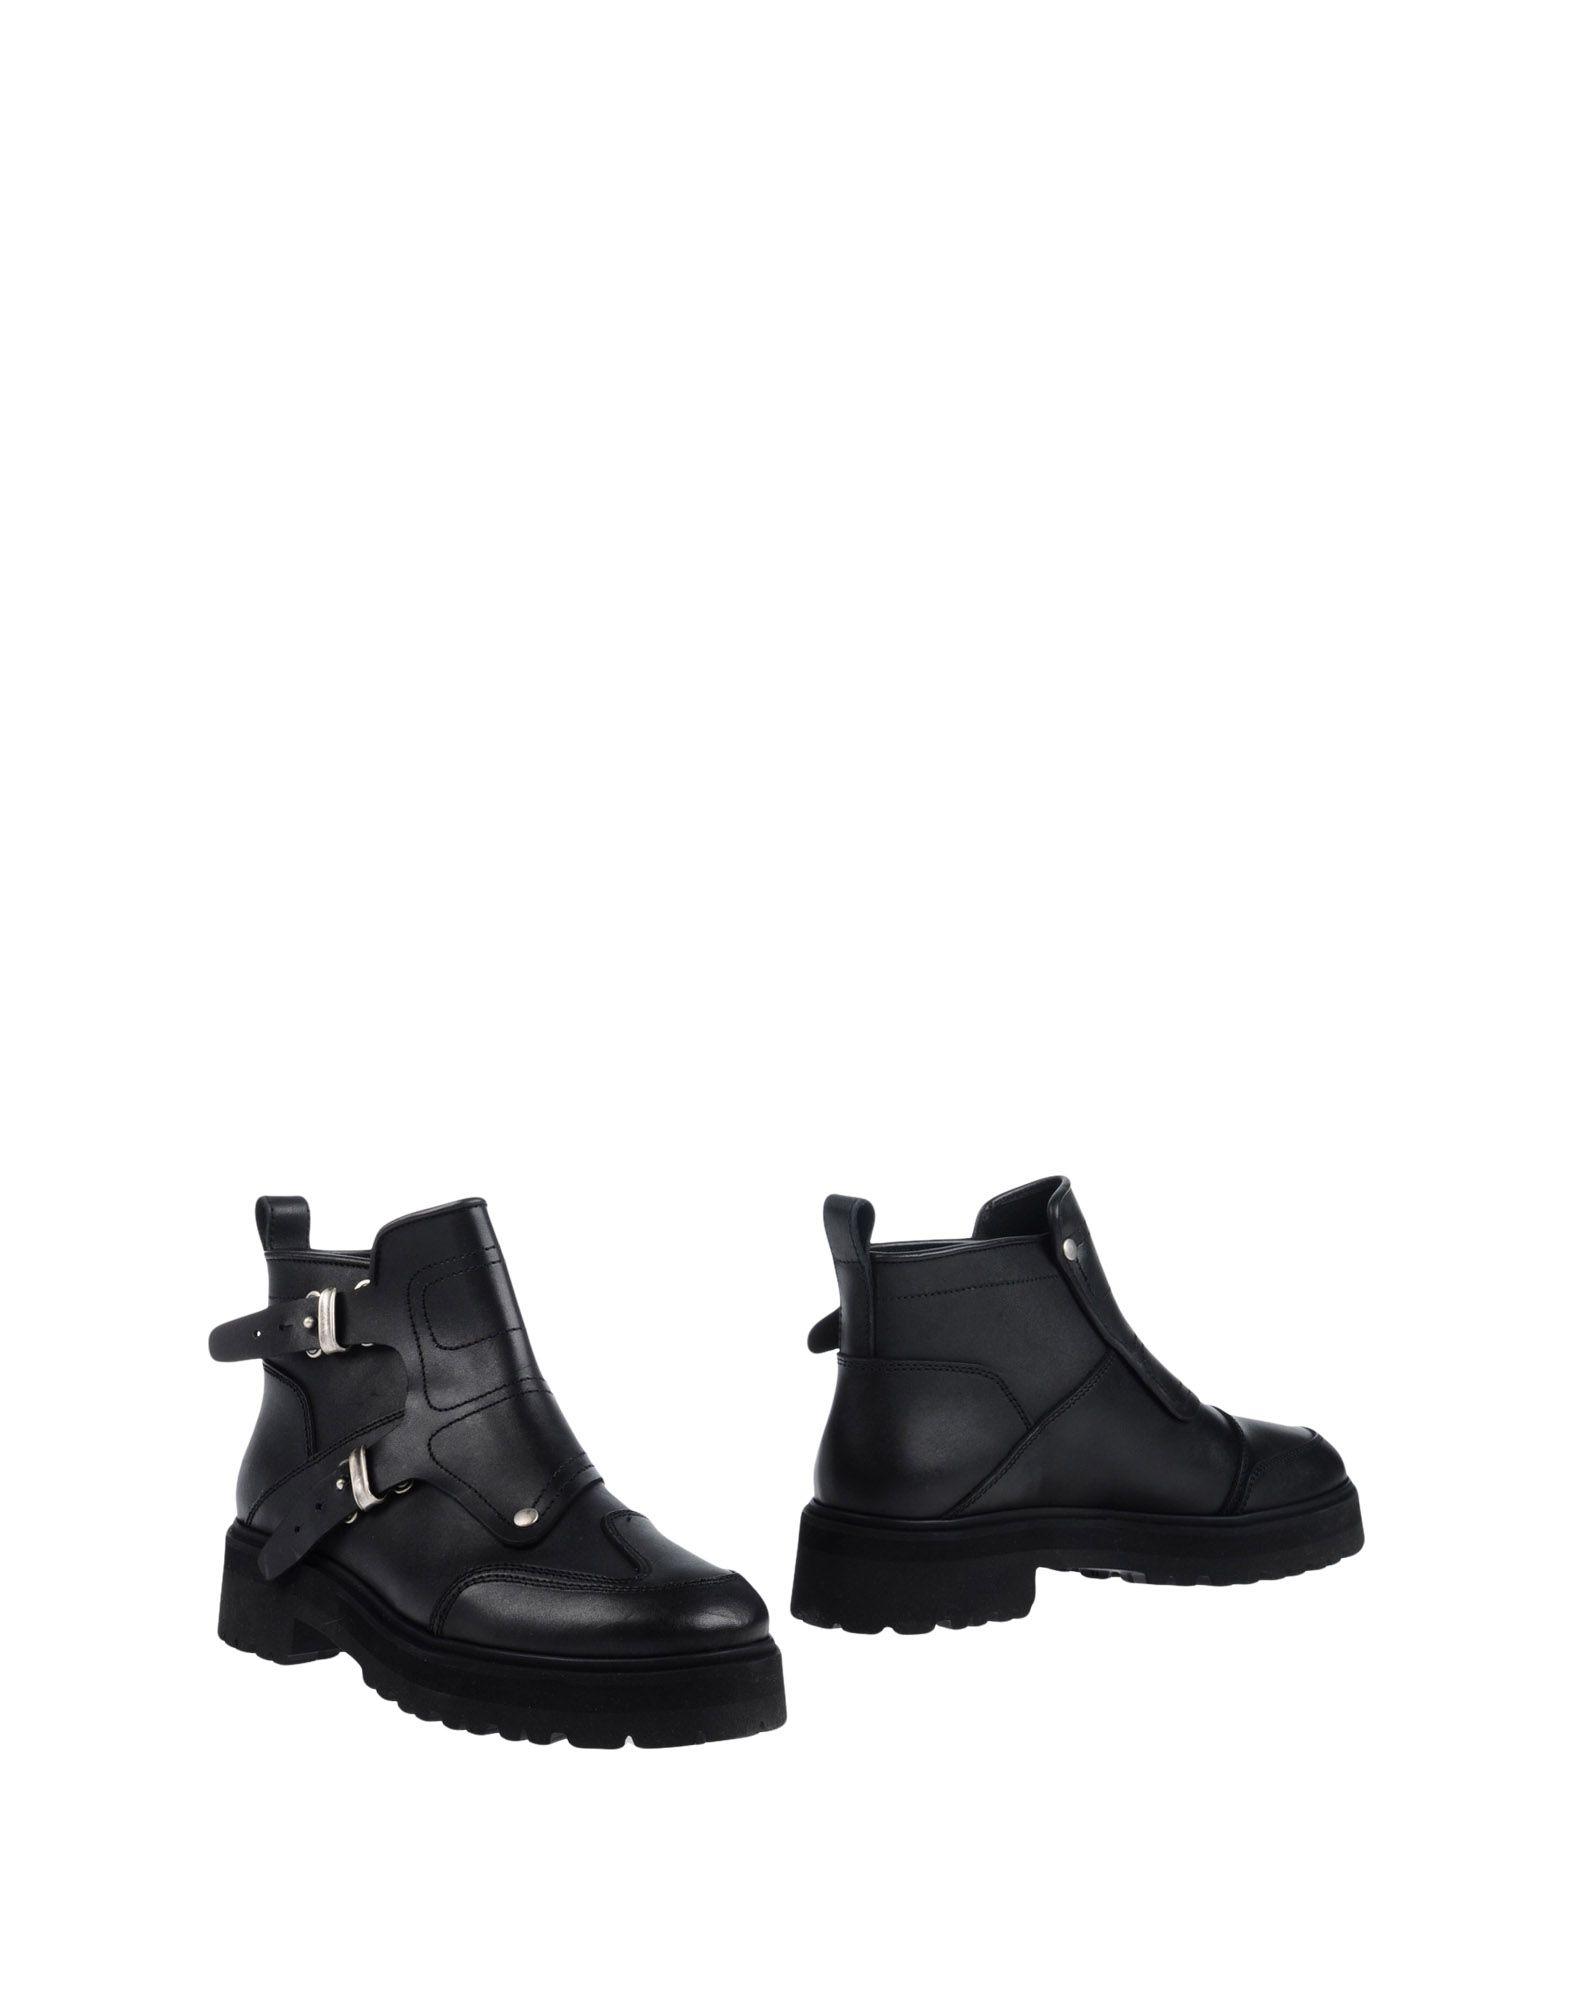 Mm6 Maison Margiela Ankle Boot - Women Boots Mm6 Maison Margiela Ankle Boots Women online on  Canada - 11268744DO 36074a